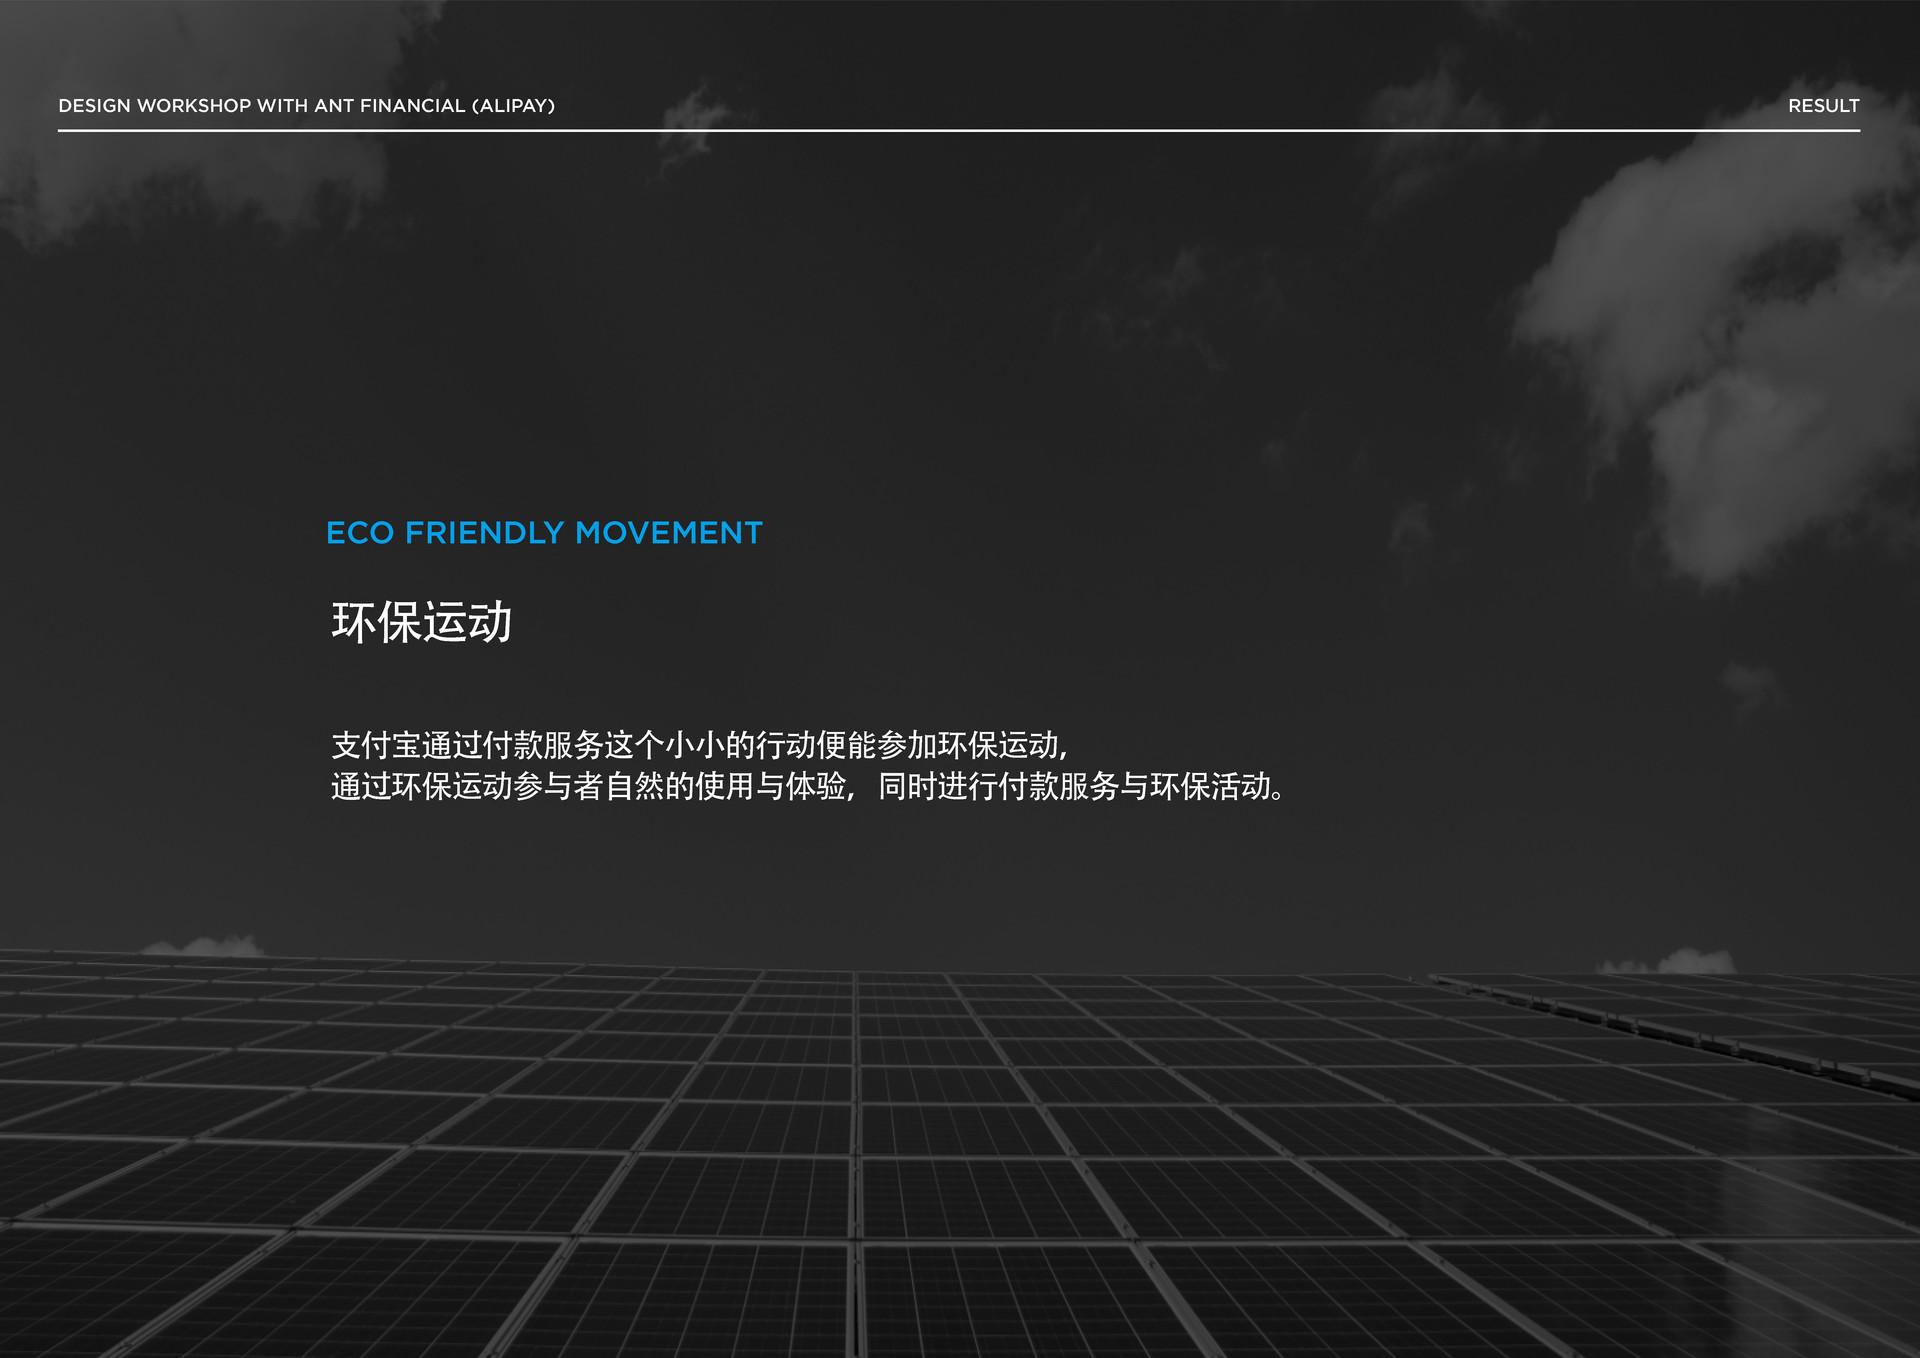 alipay_workshop_中文_페이지_48.jpg